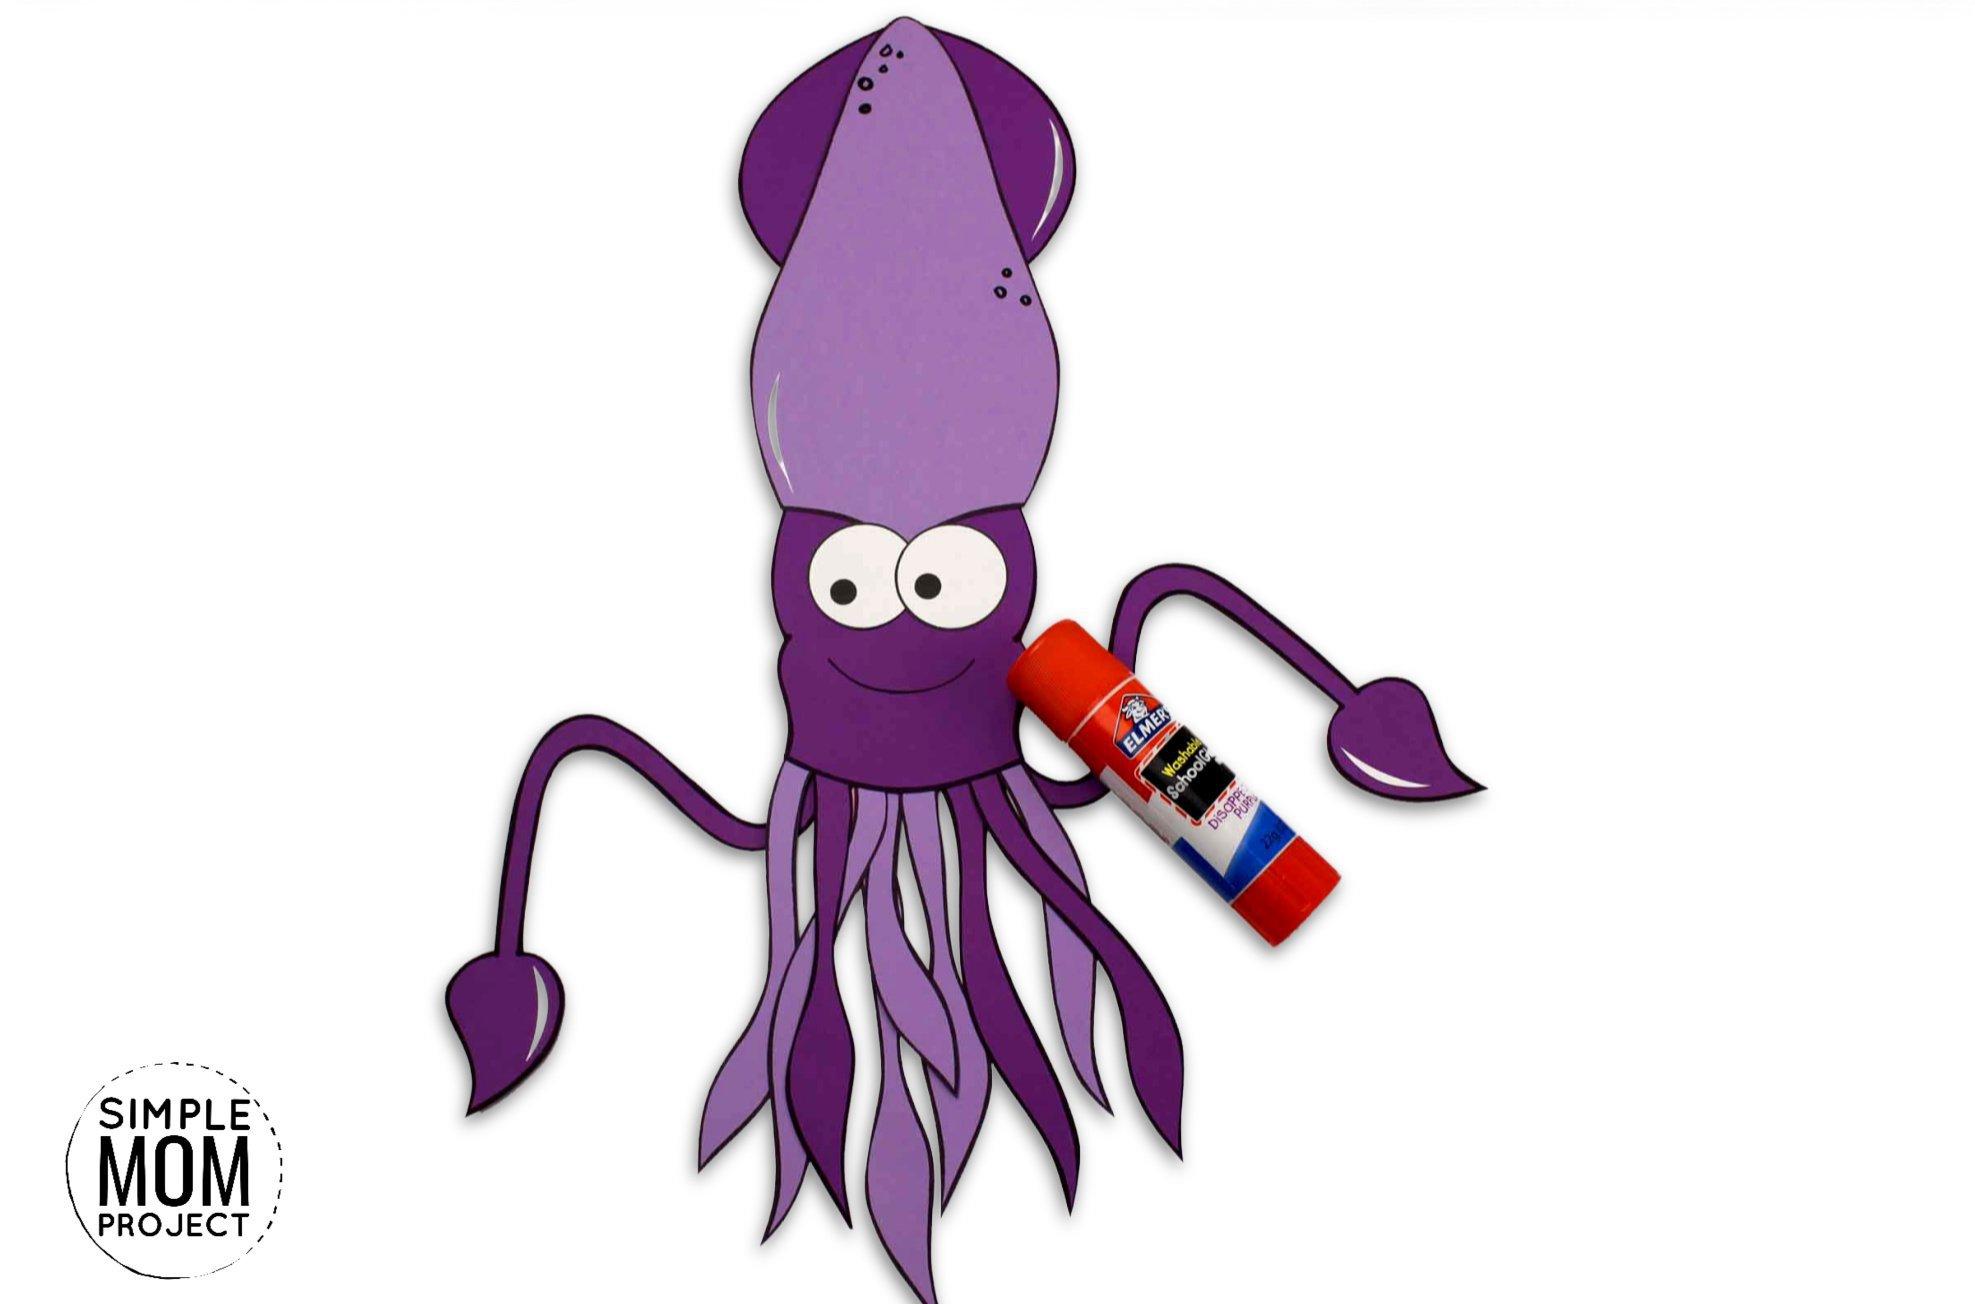 Free Printable Squid Ocean Animal Craft for Kids, preschoolers and toddlers